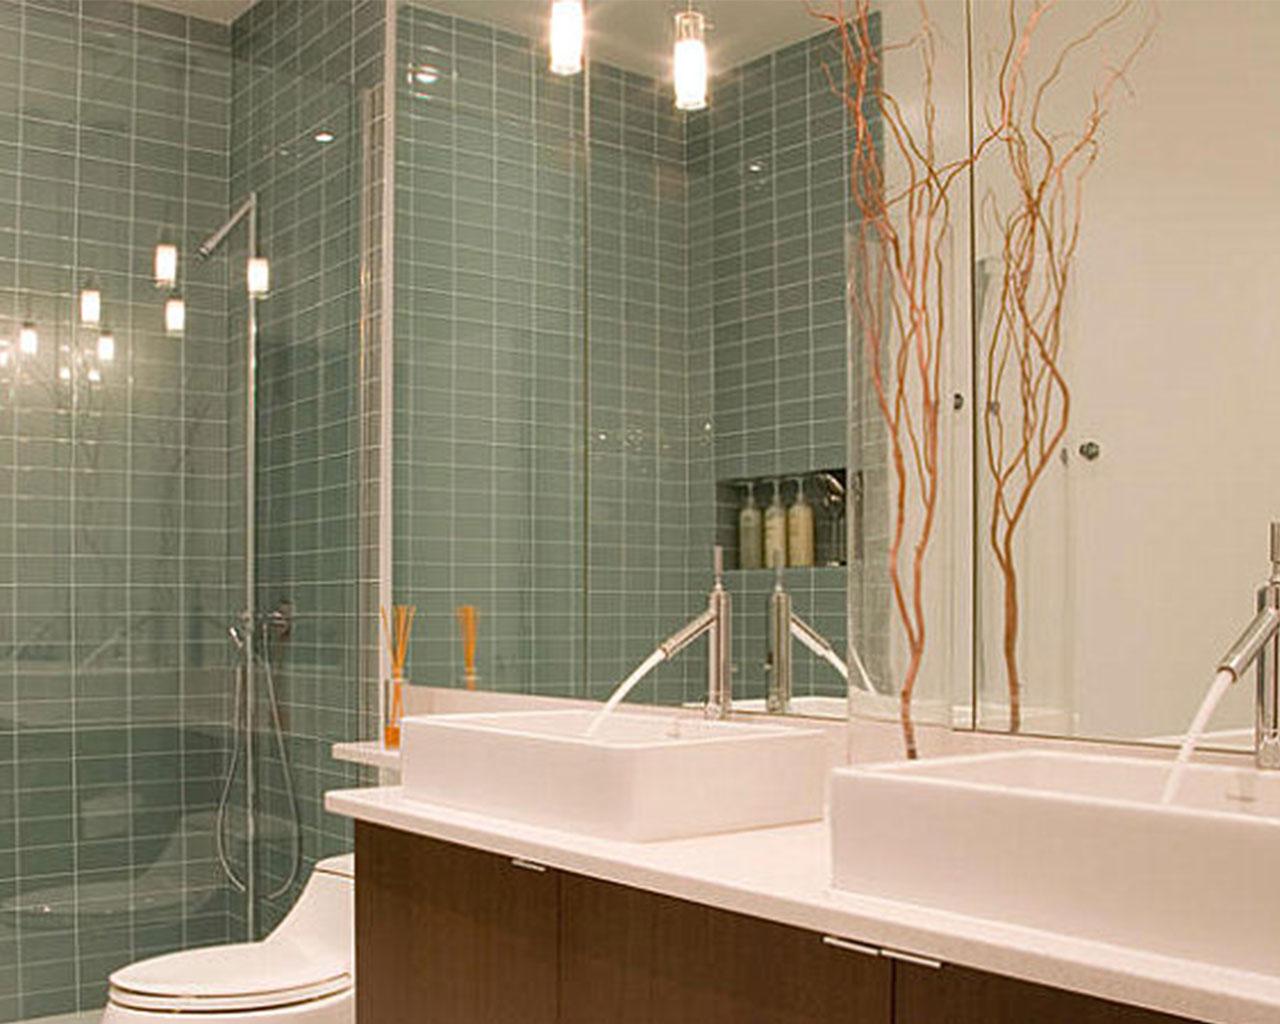 Small full bathroom design ideas - Bathroom Idea Small